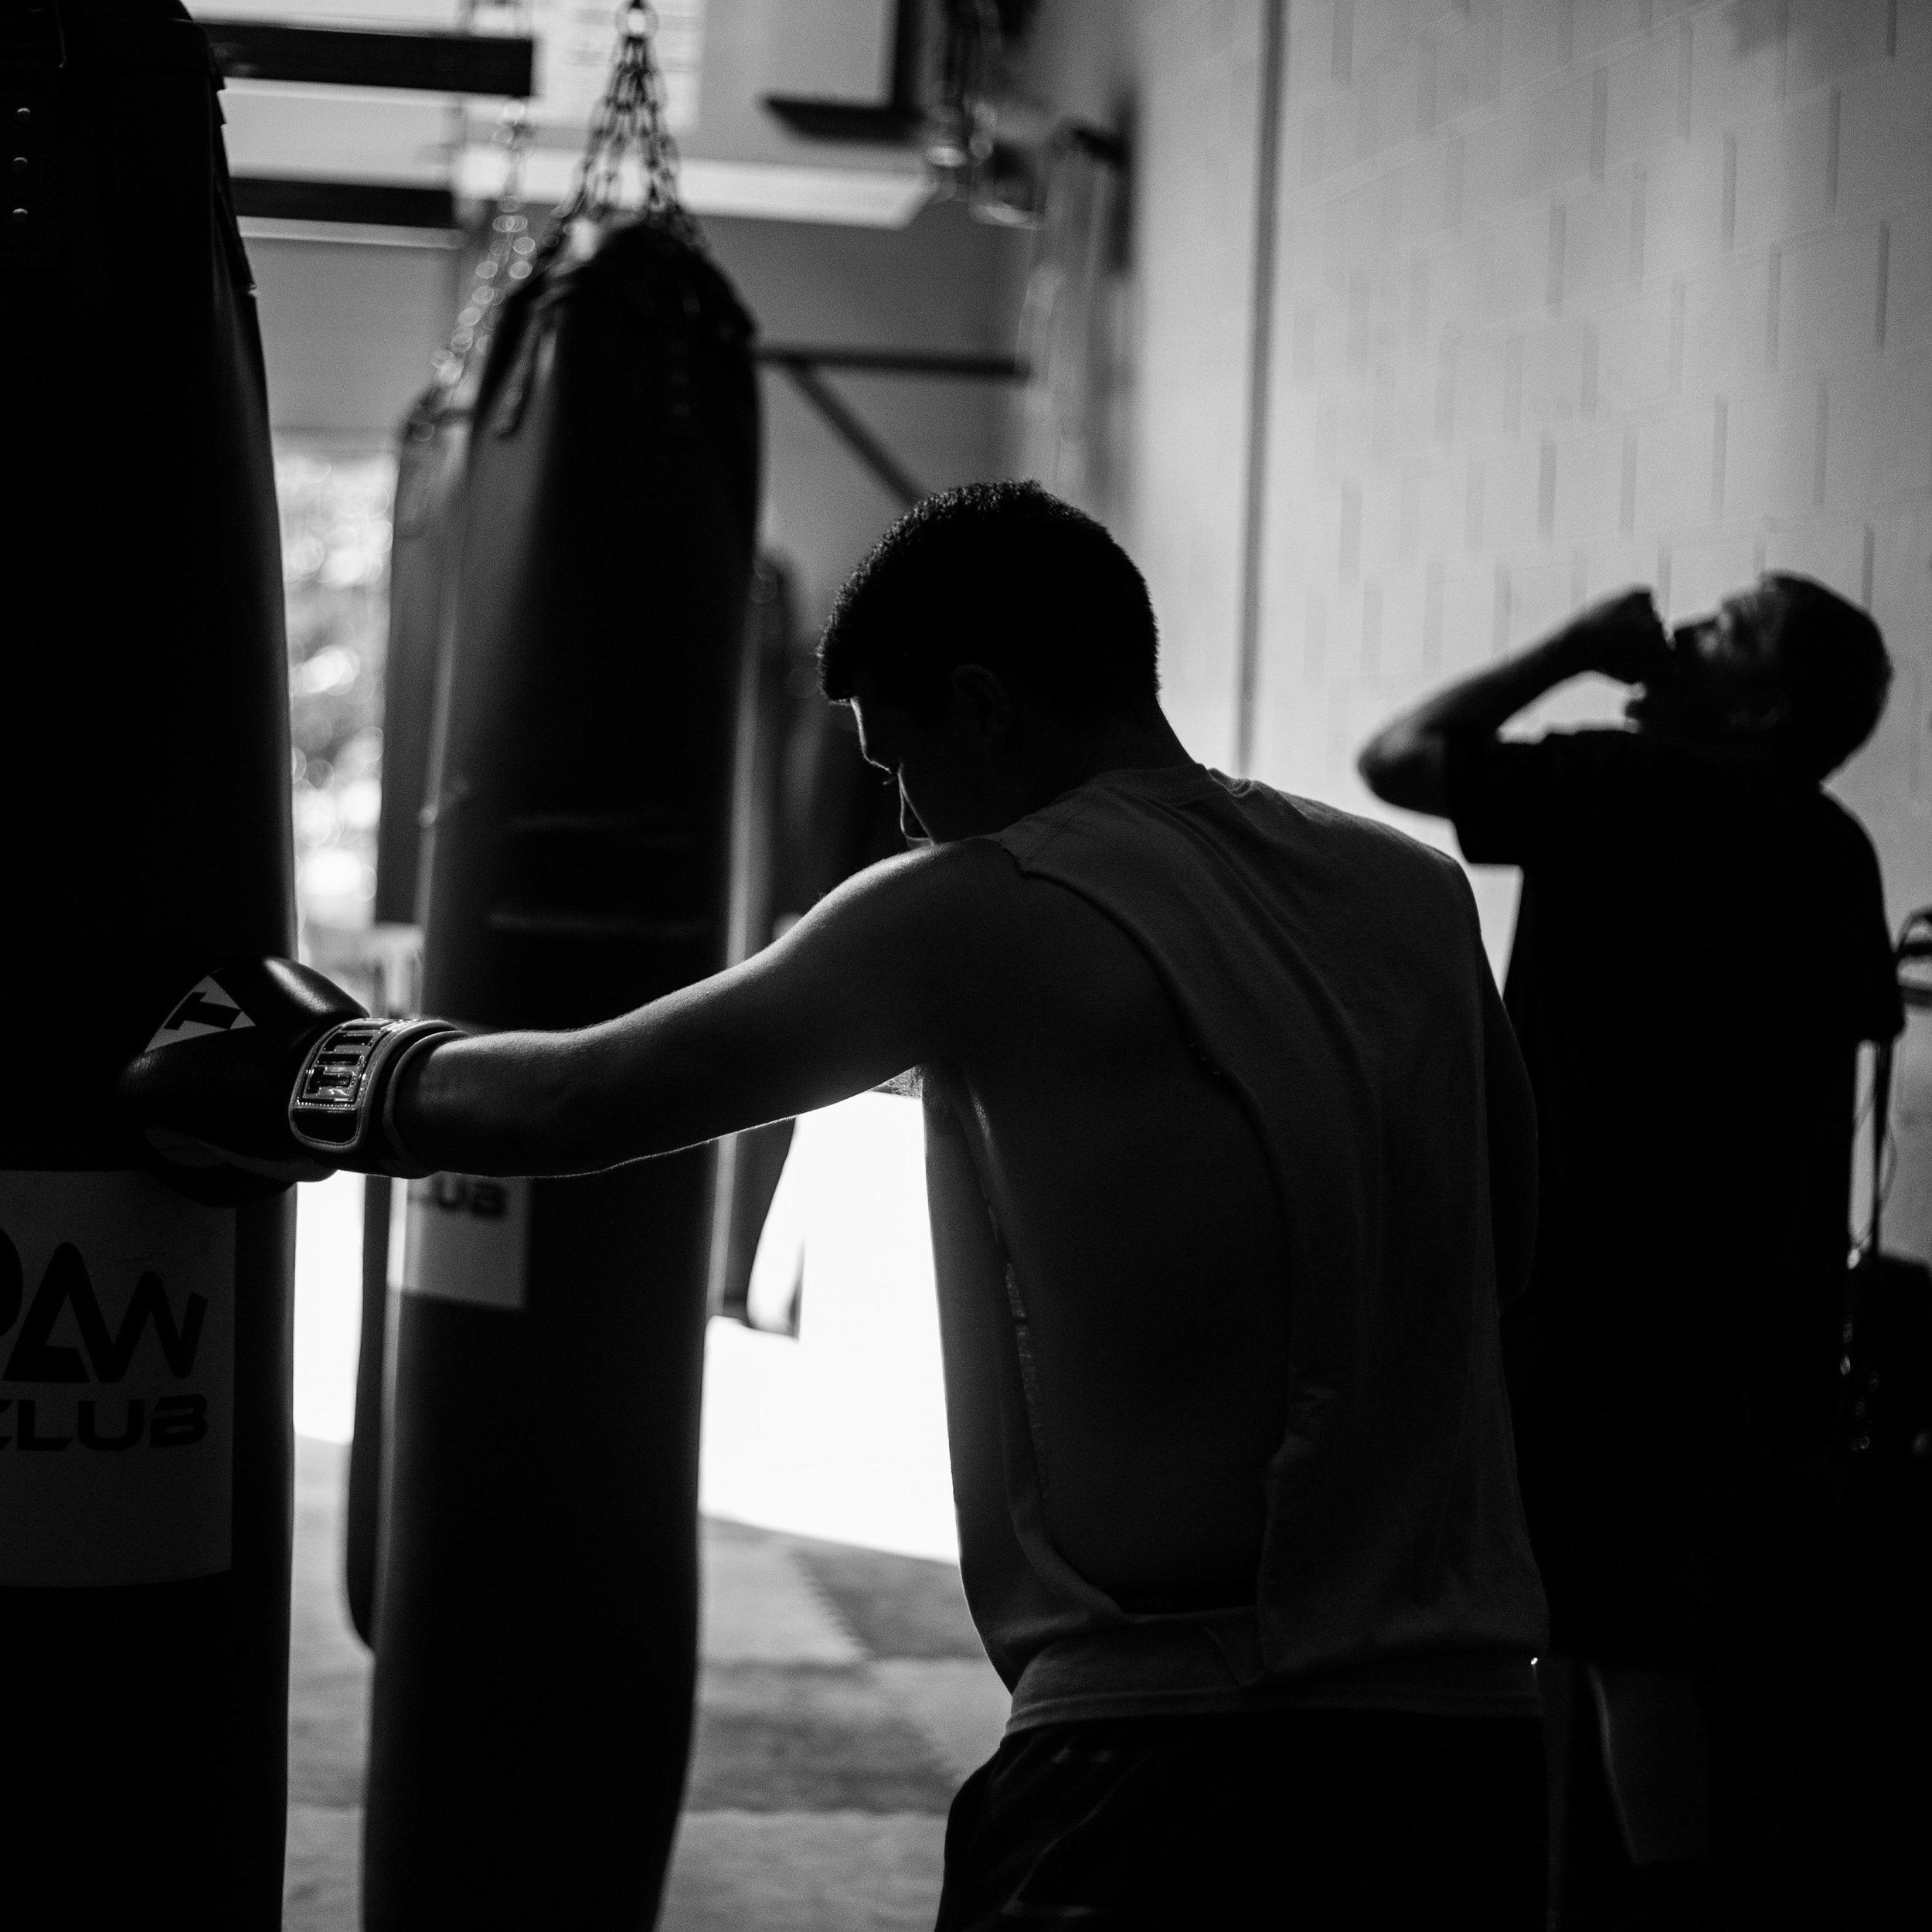 southpaw_boxing-1.jpg